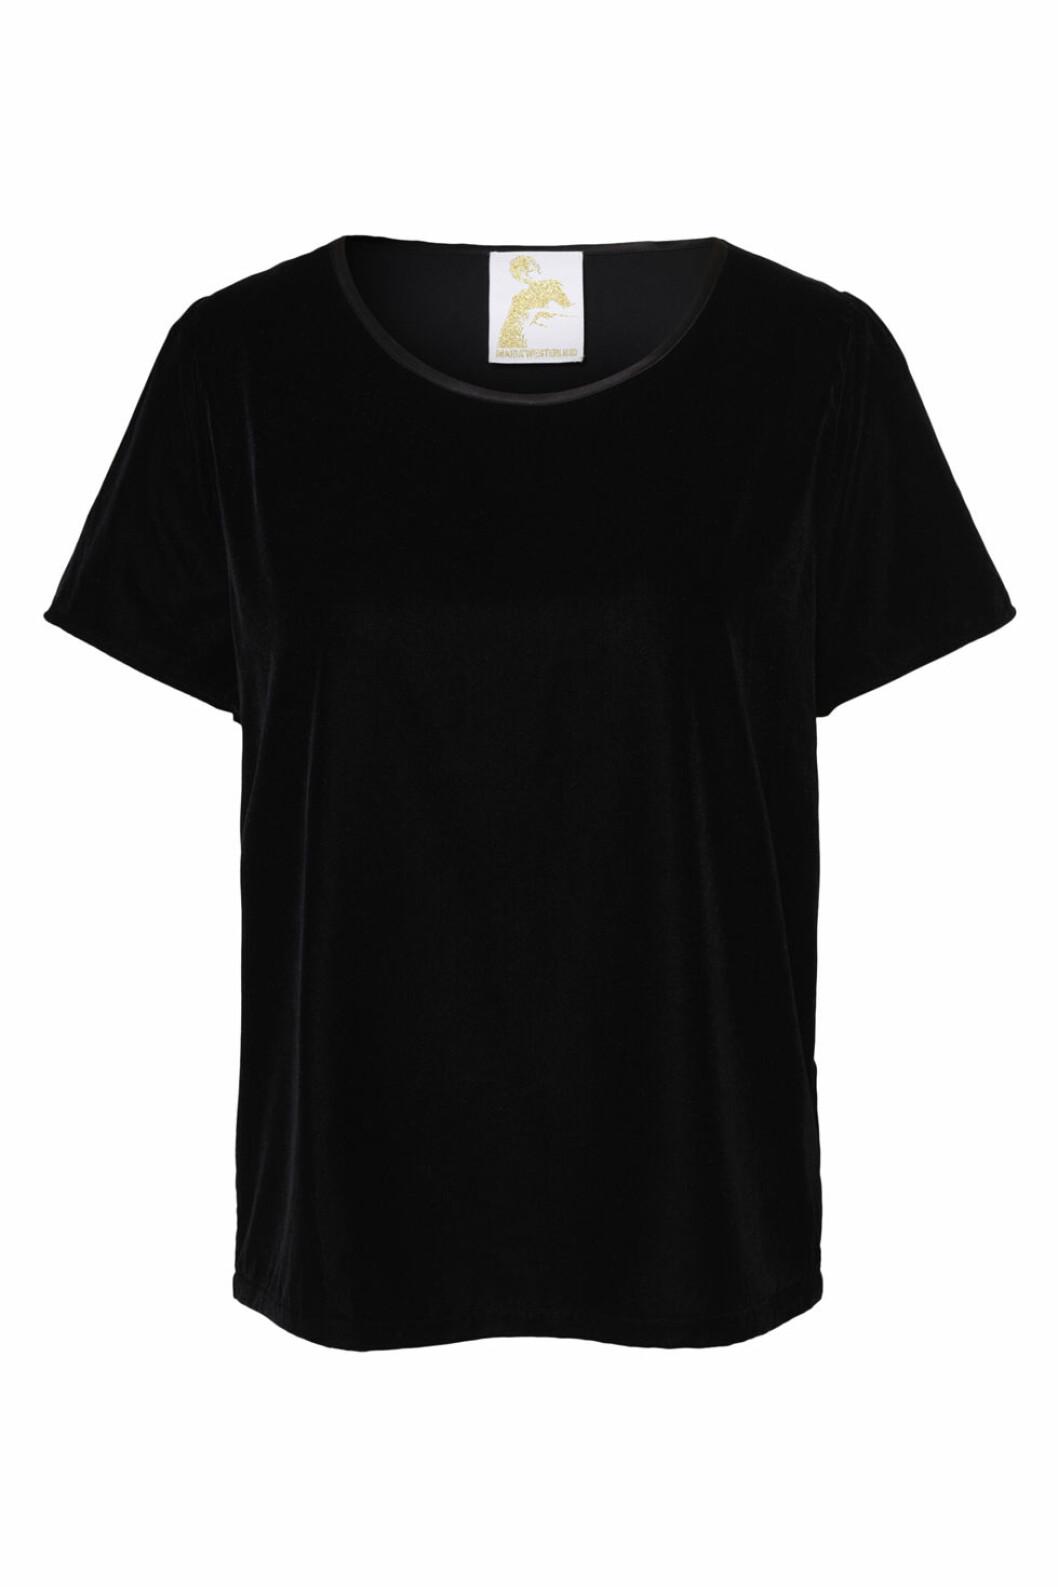 Maria Westerlind x MQ sammets t-shirt